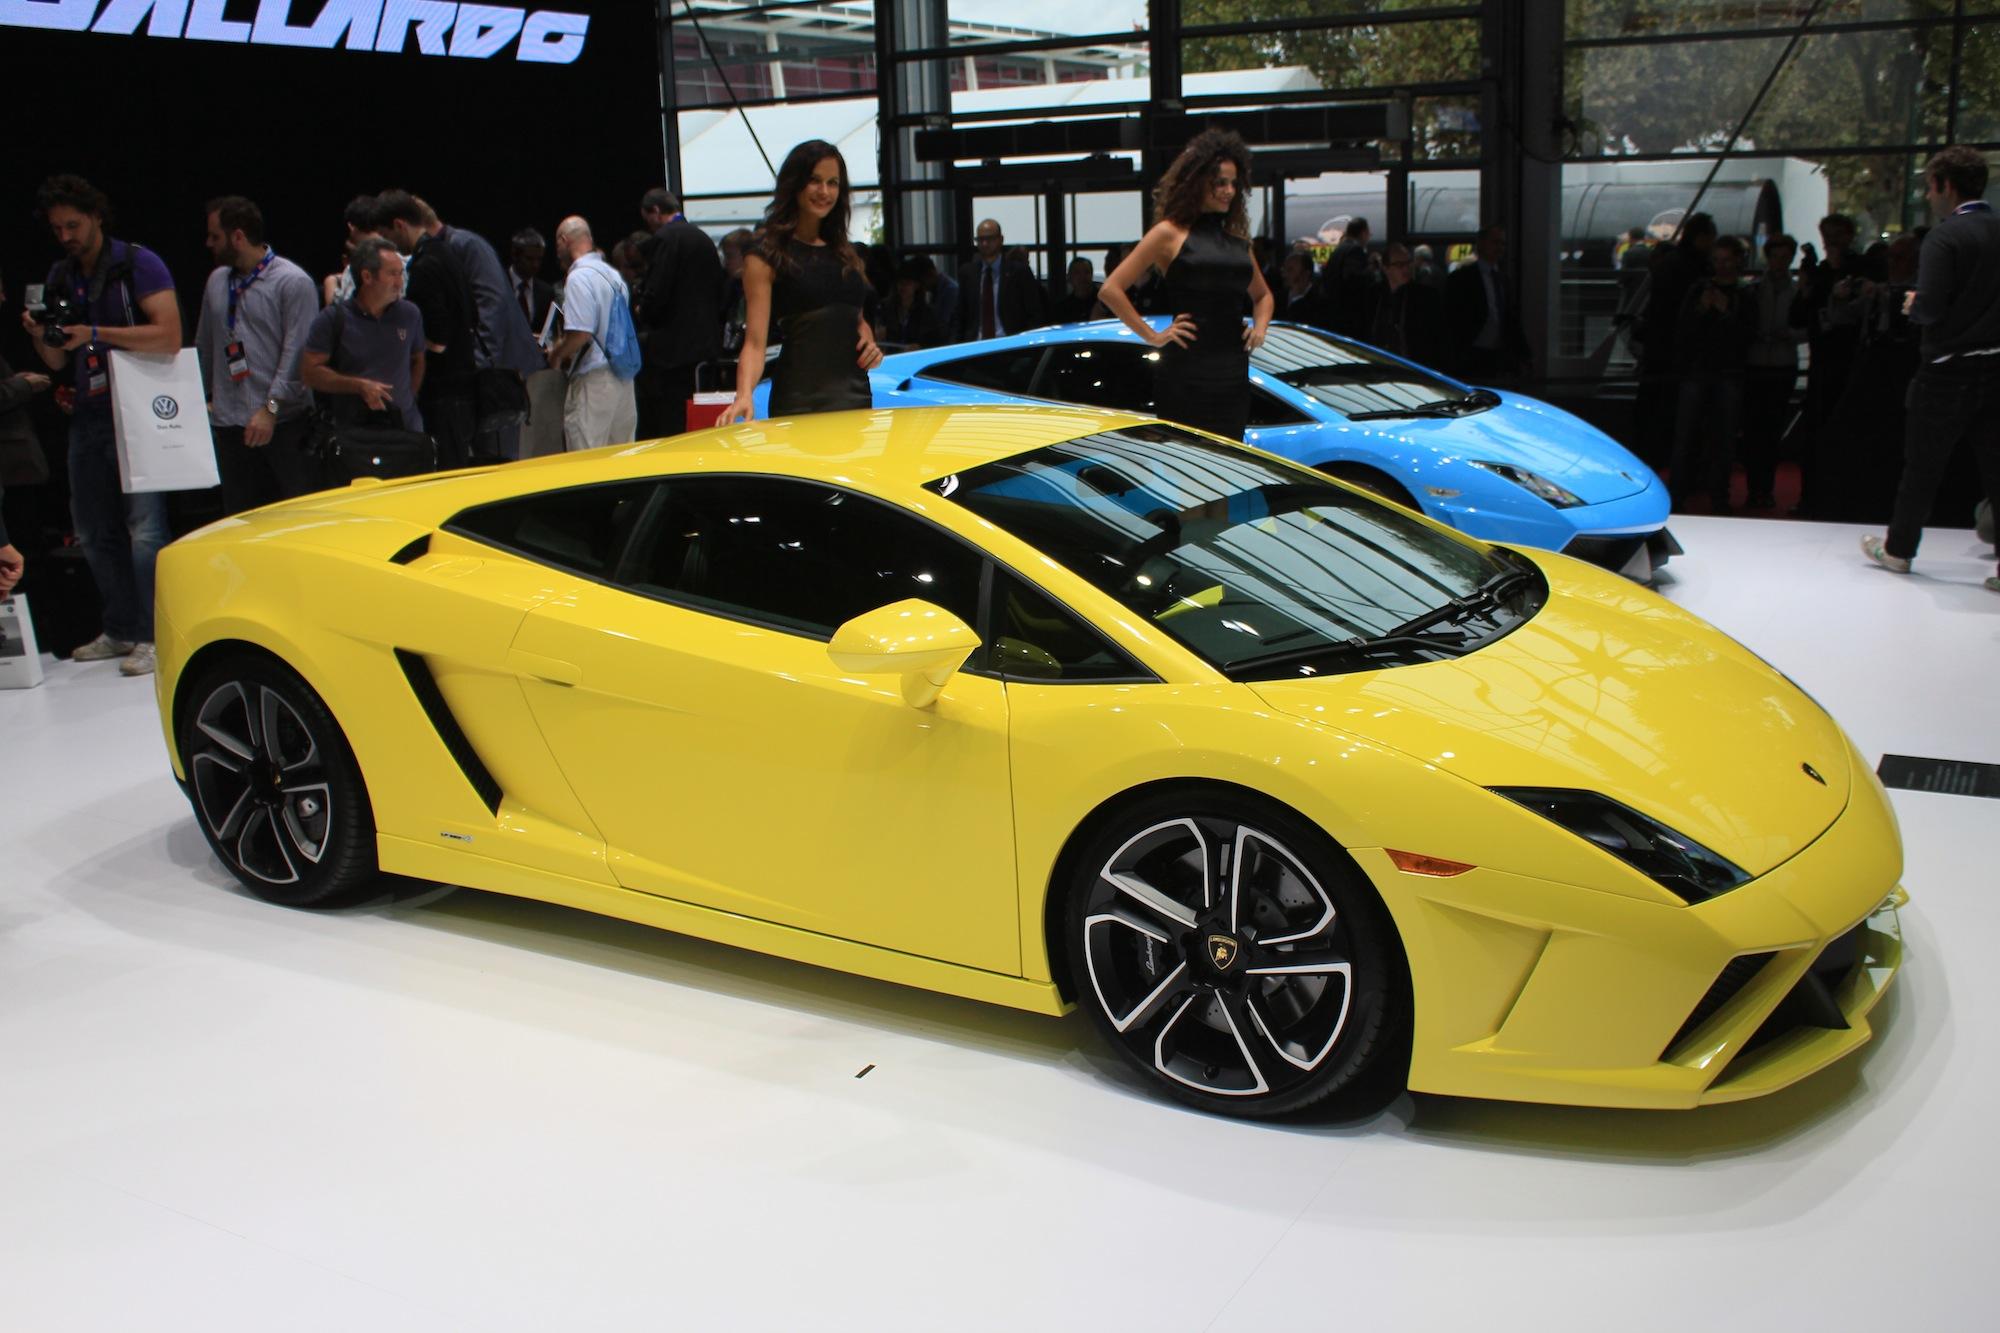 Image Result For How To Buy A Lamborghini Gallardo